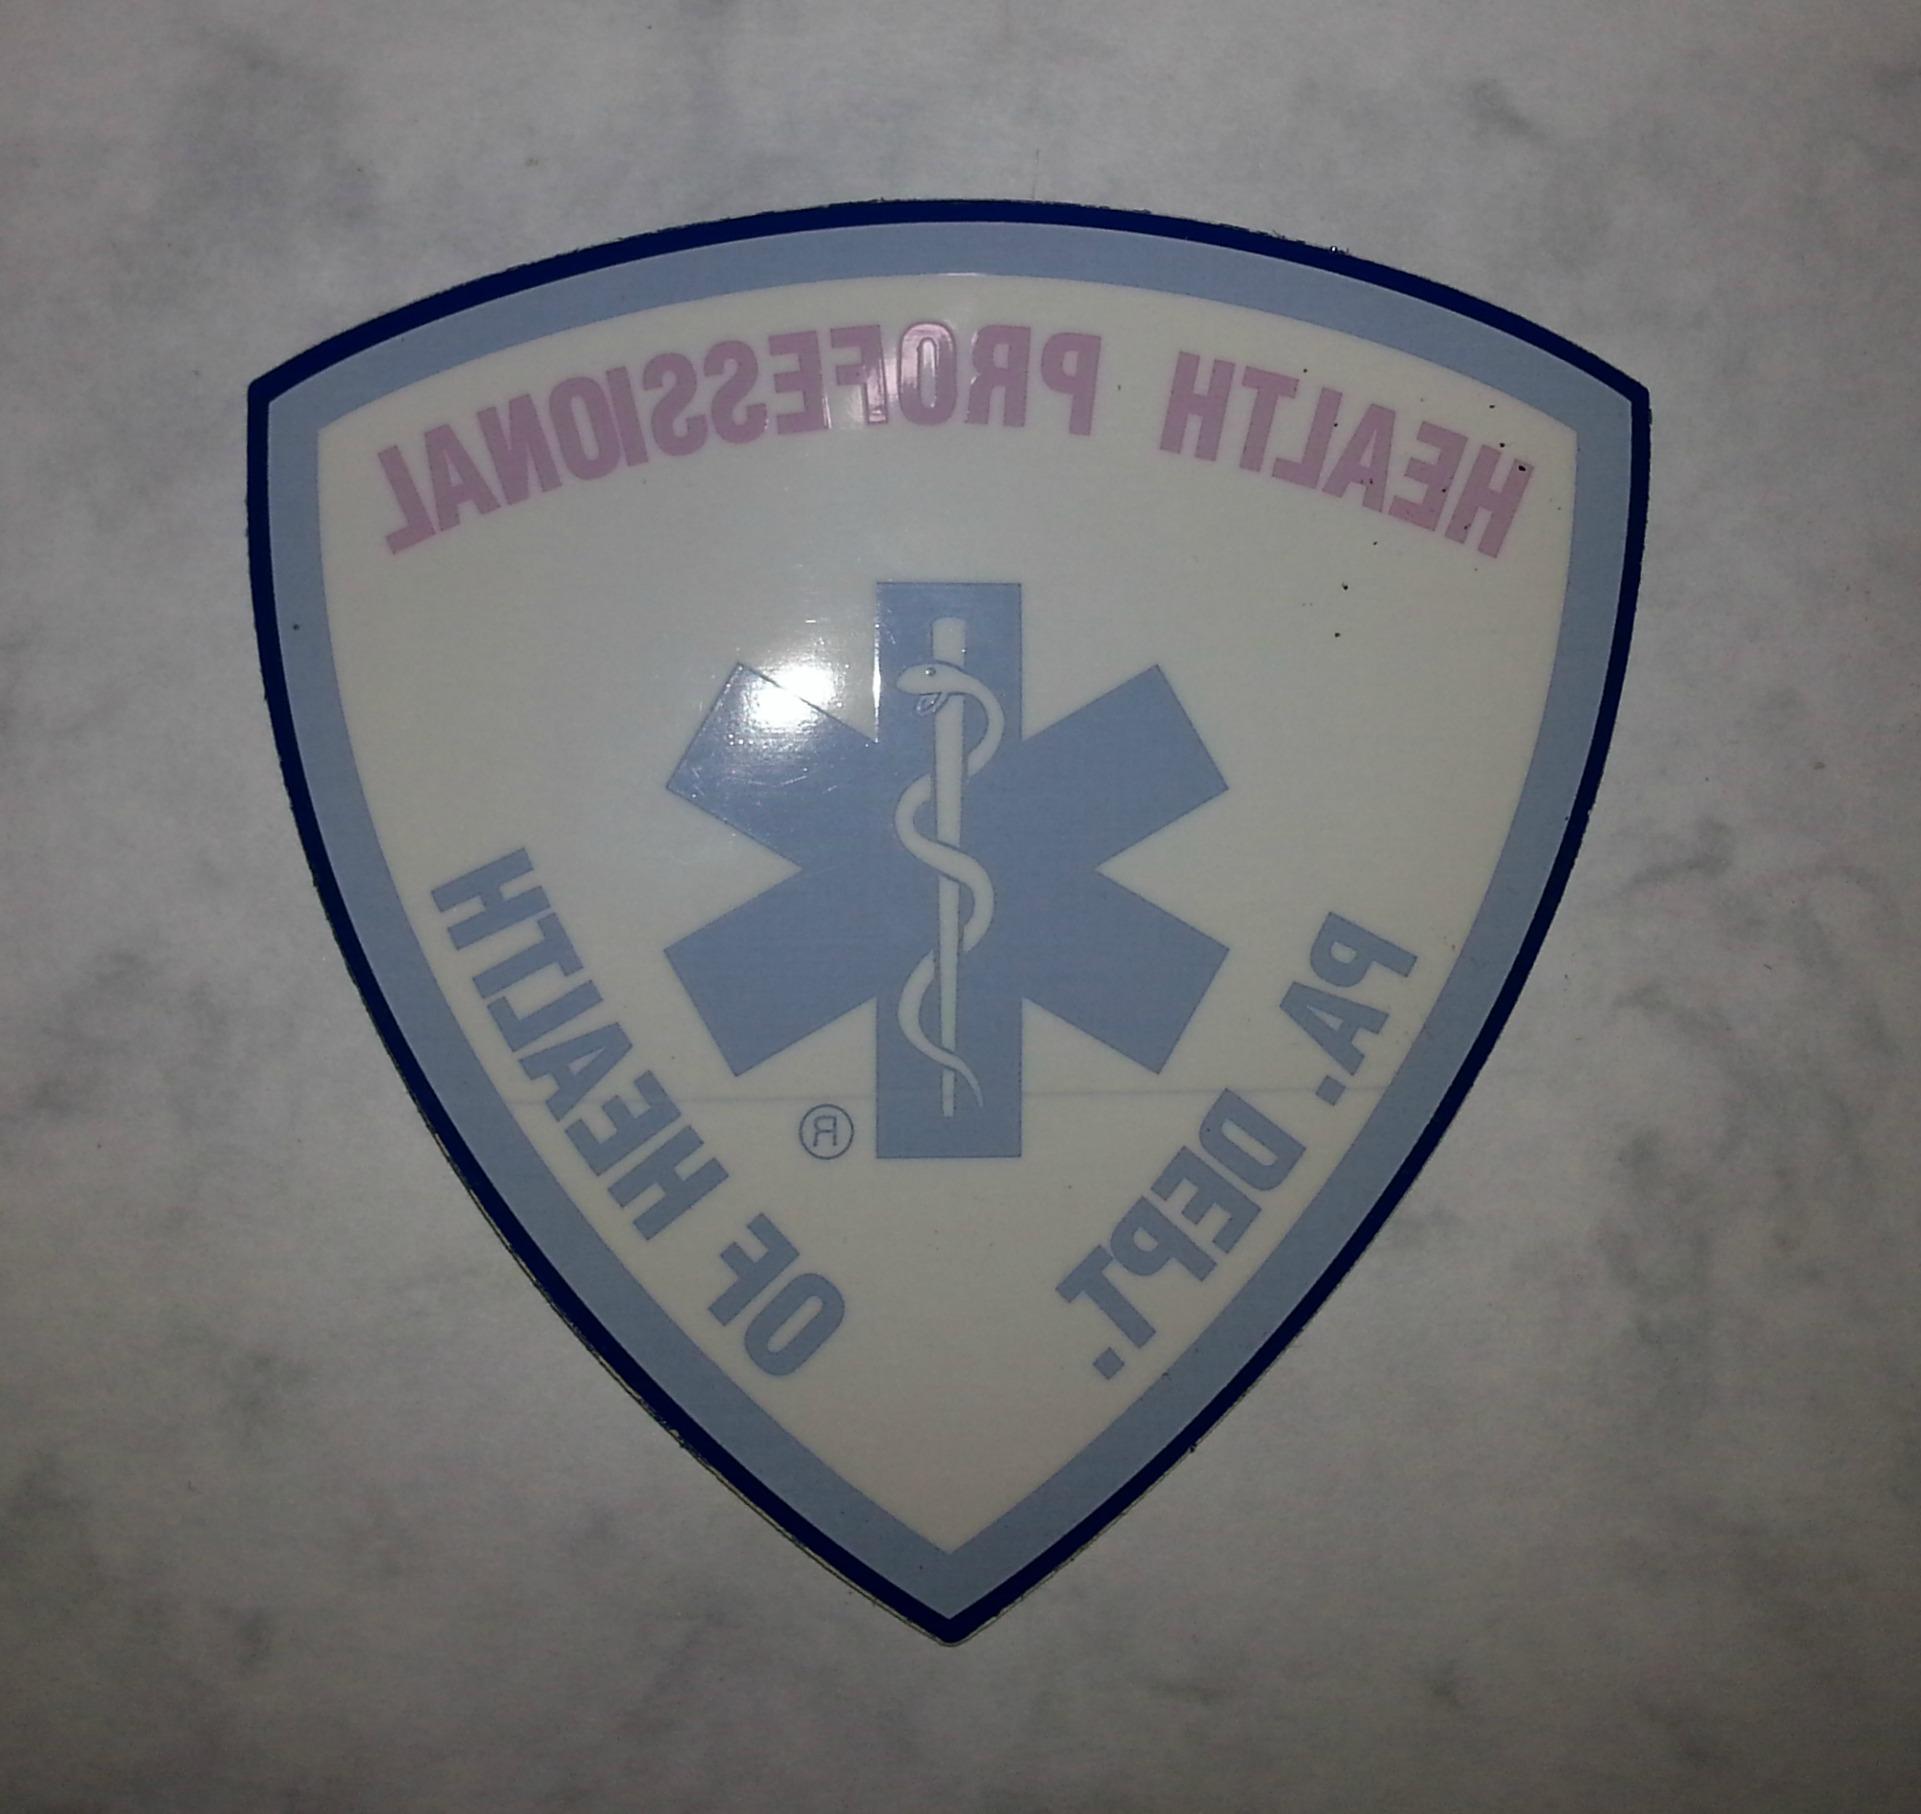 Pa Dept of Health EMS